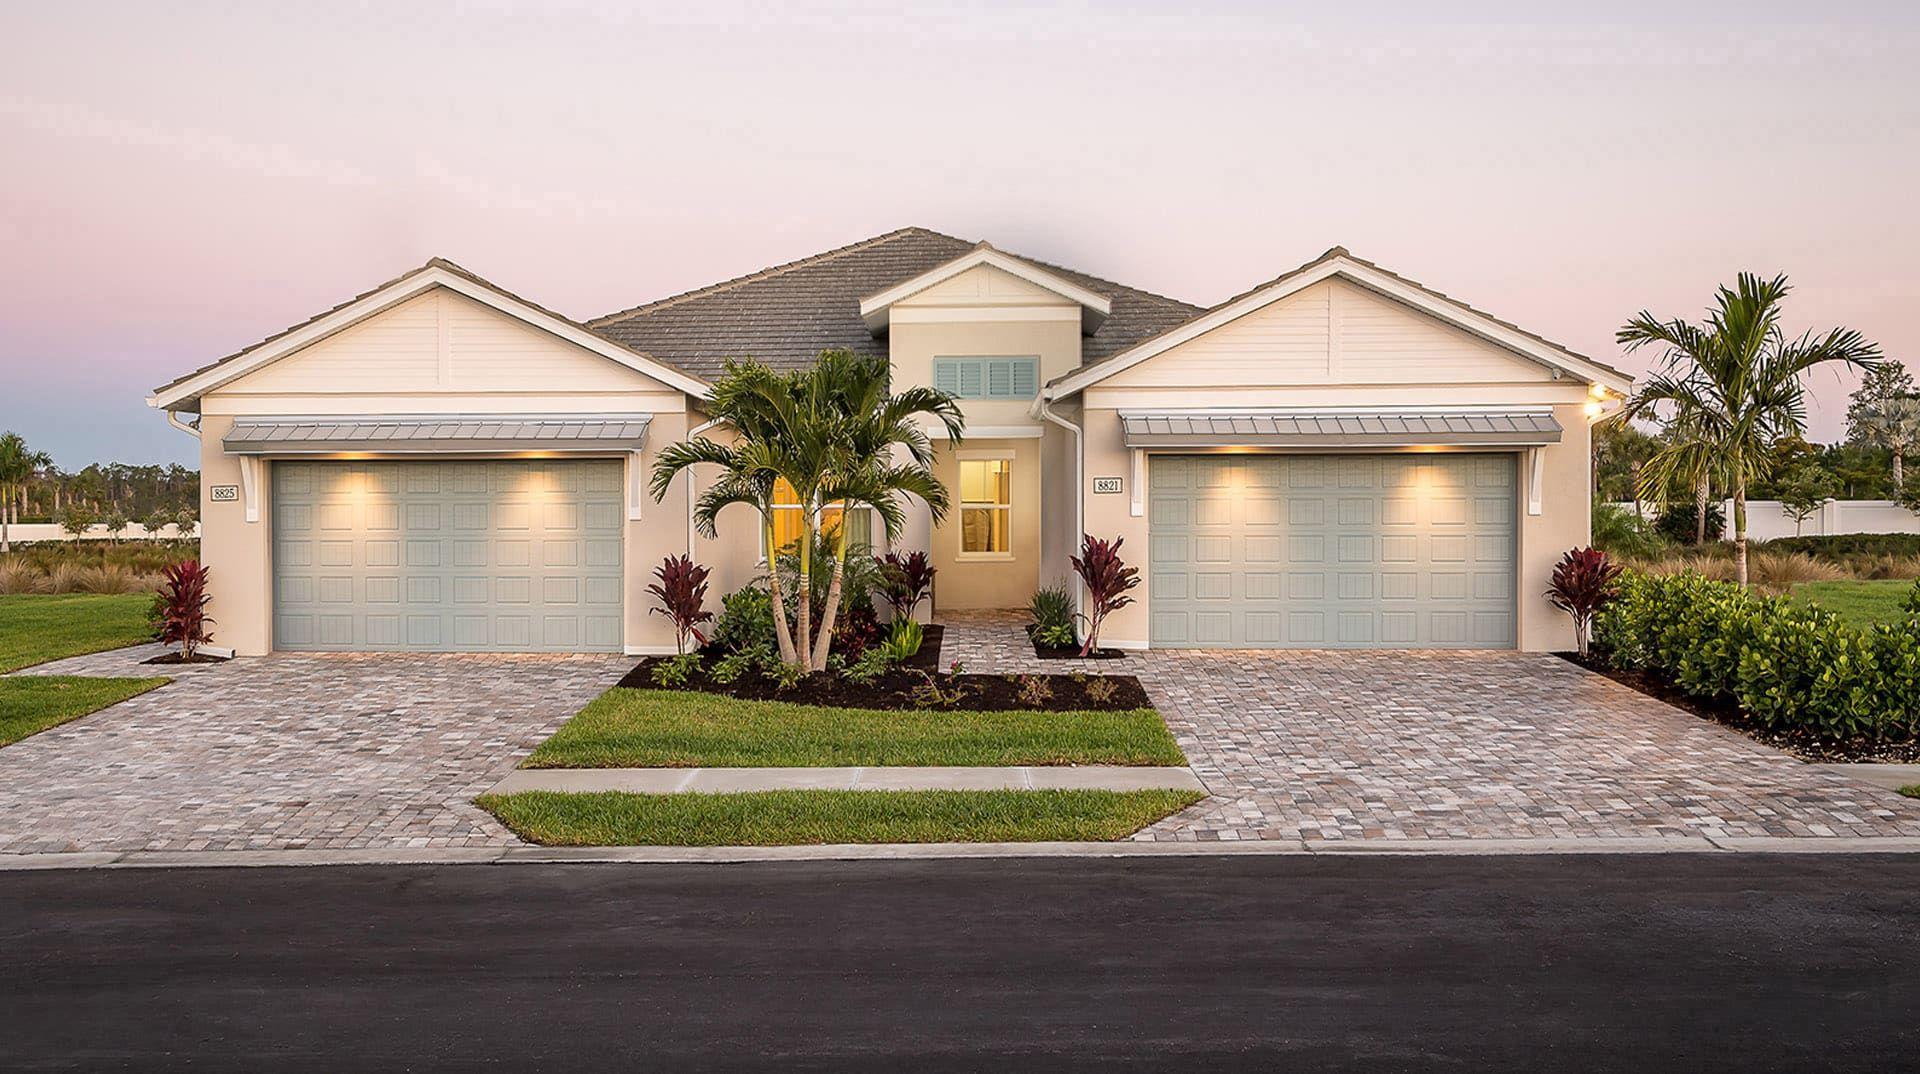 sanibel island mortgage, mortgage sanibel island, sanibel island mortgage rates, sanibel island mortgage company, sanibel island mortgage lender, sanibel island mortgage broker,